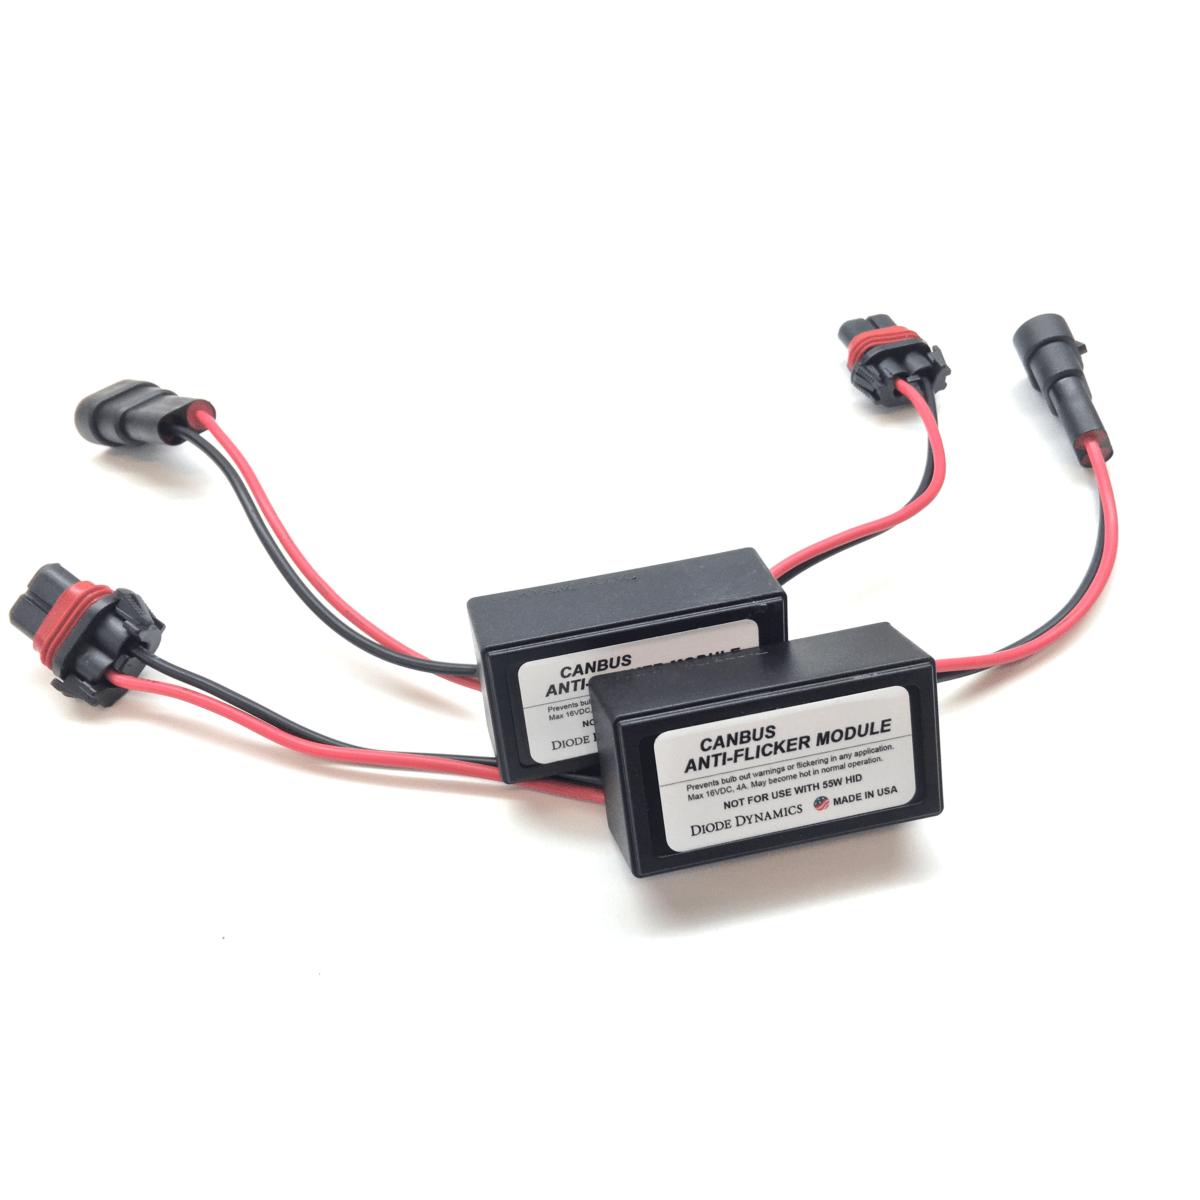 Diode Dynamics CAN-Bus Anti-Flicker Module (pair) | HID Kit Pros